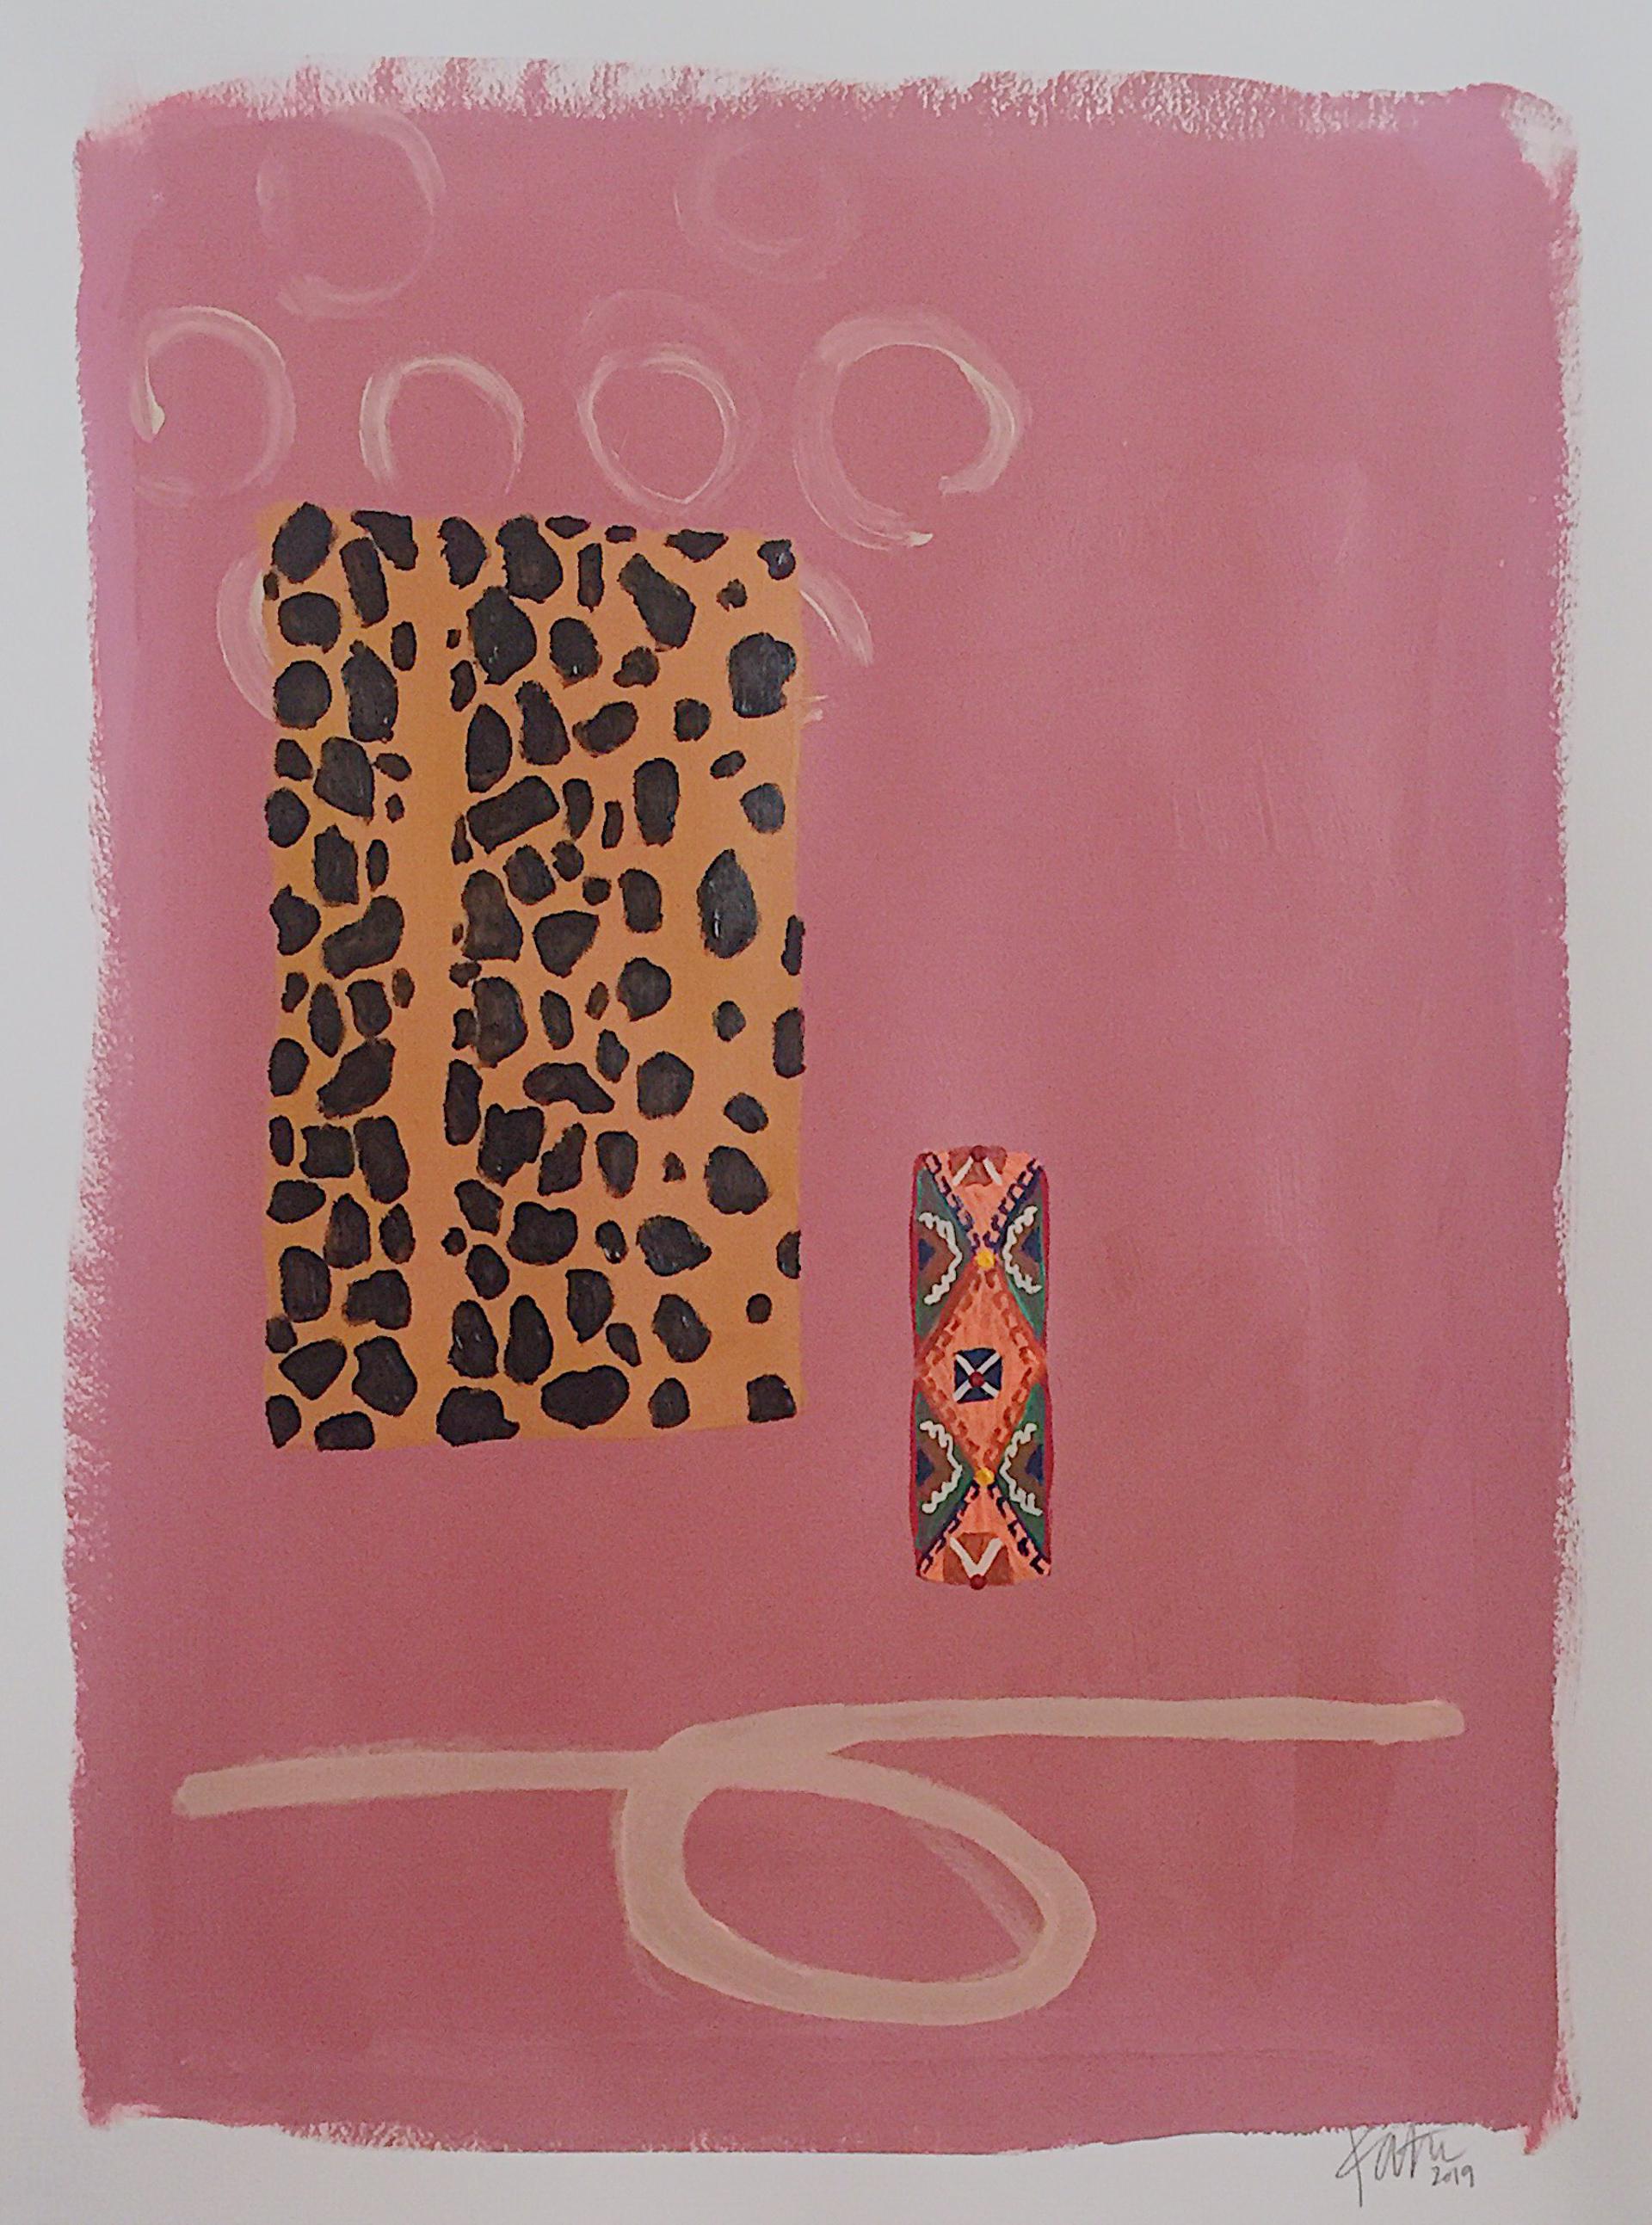 SHAPES IV by Kathleen Jones